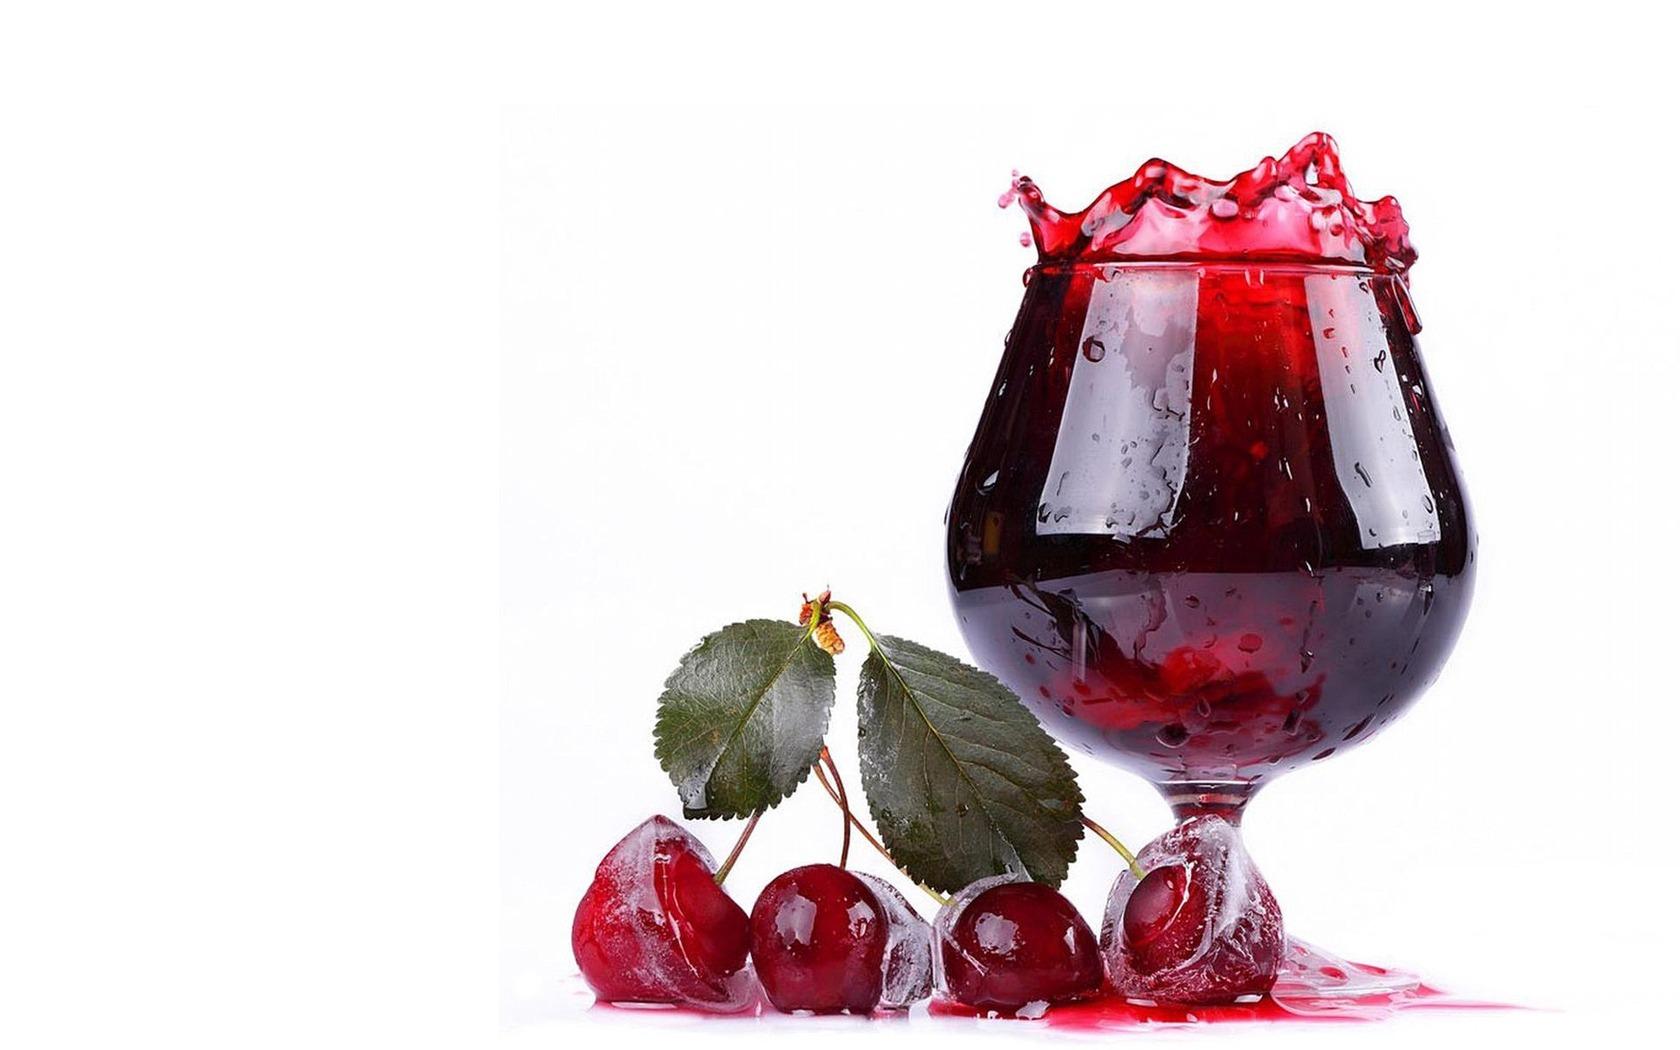 Download wallpaper 1680x1050 juice beverage fruit white 1680x1050